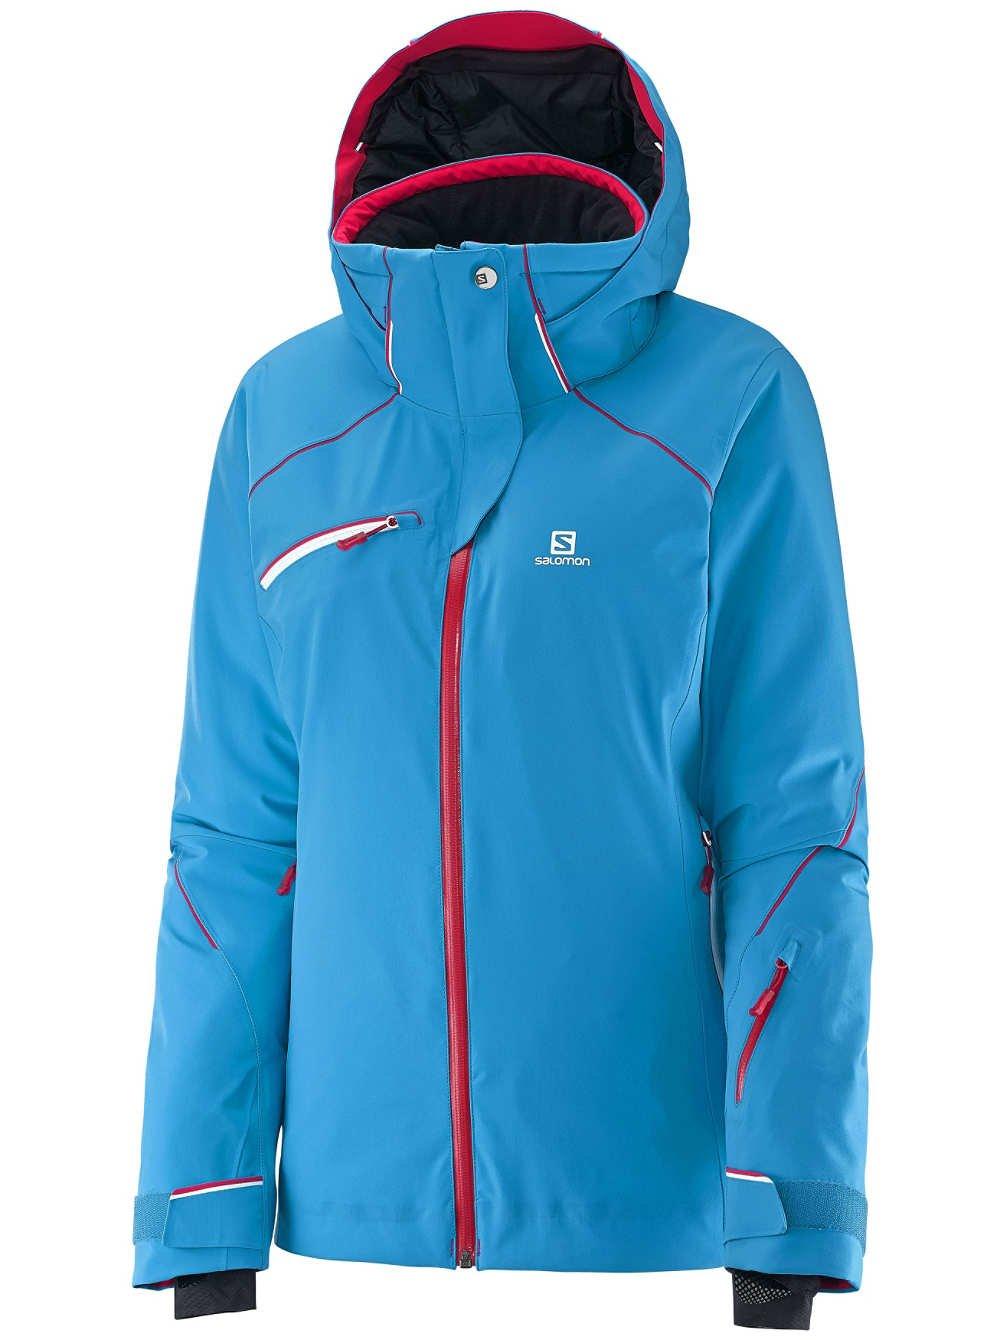 Damen Snowboard Jacke Salomon Speed Jacket